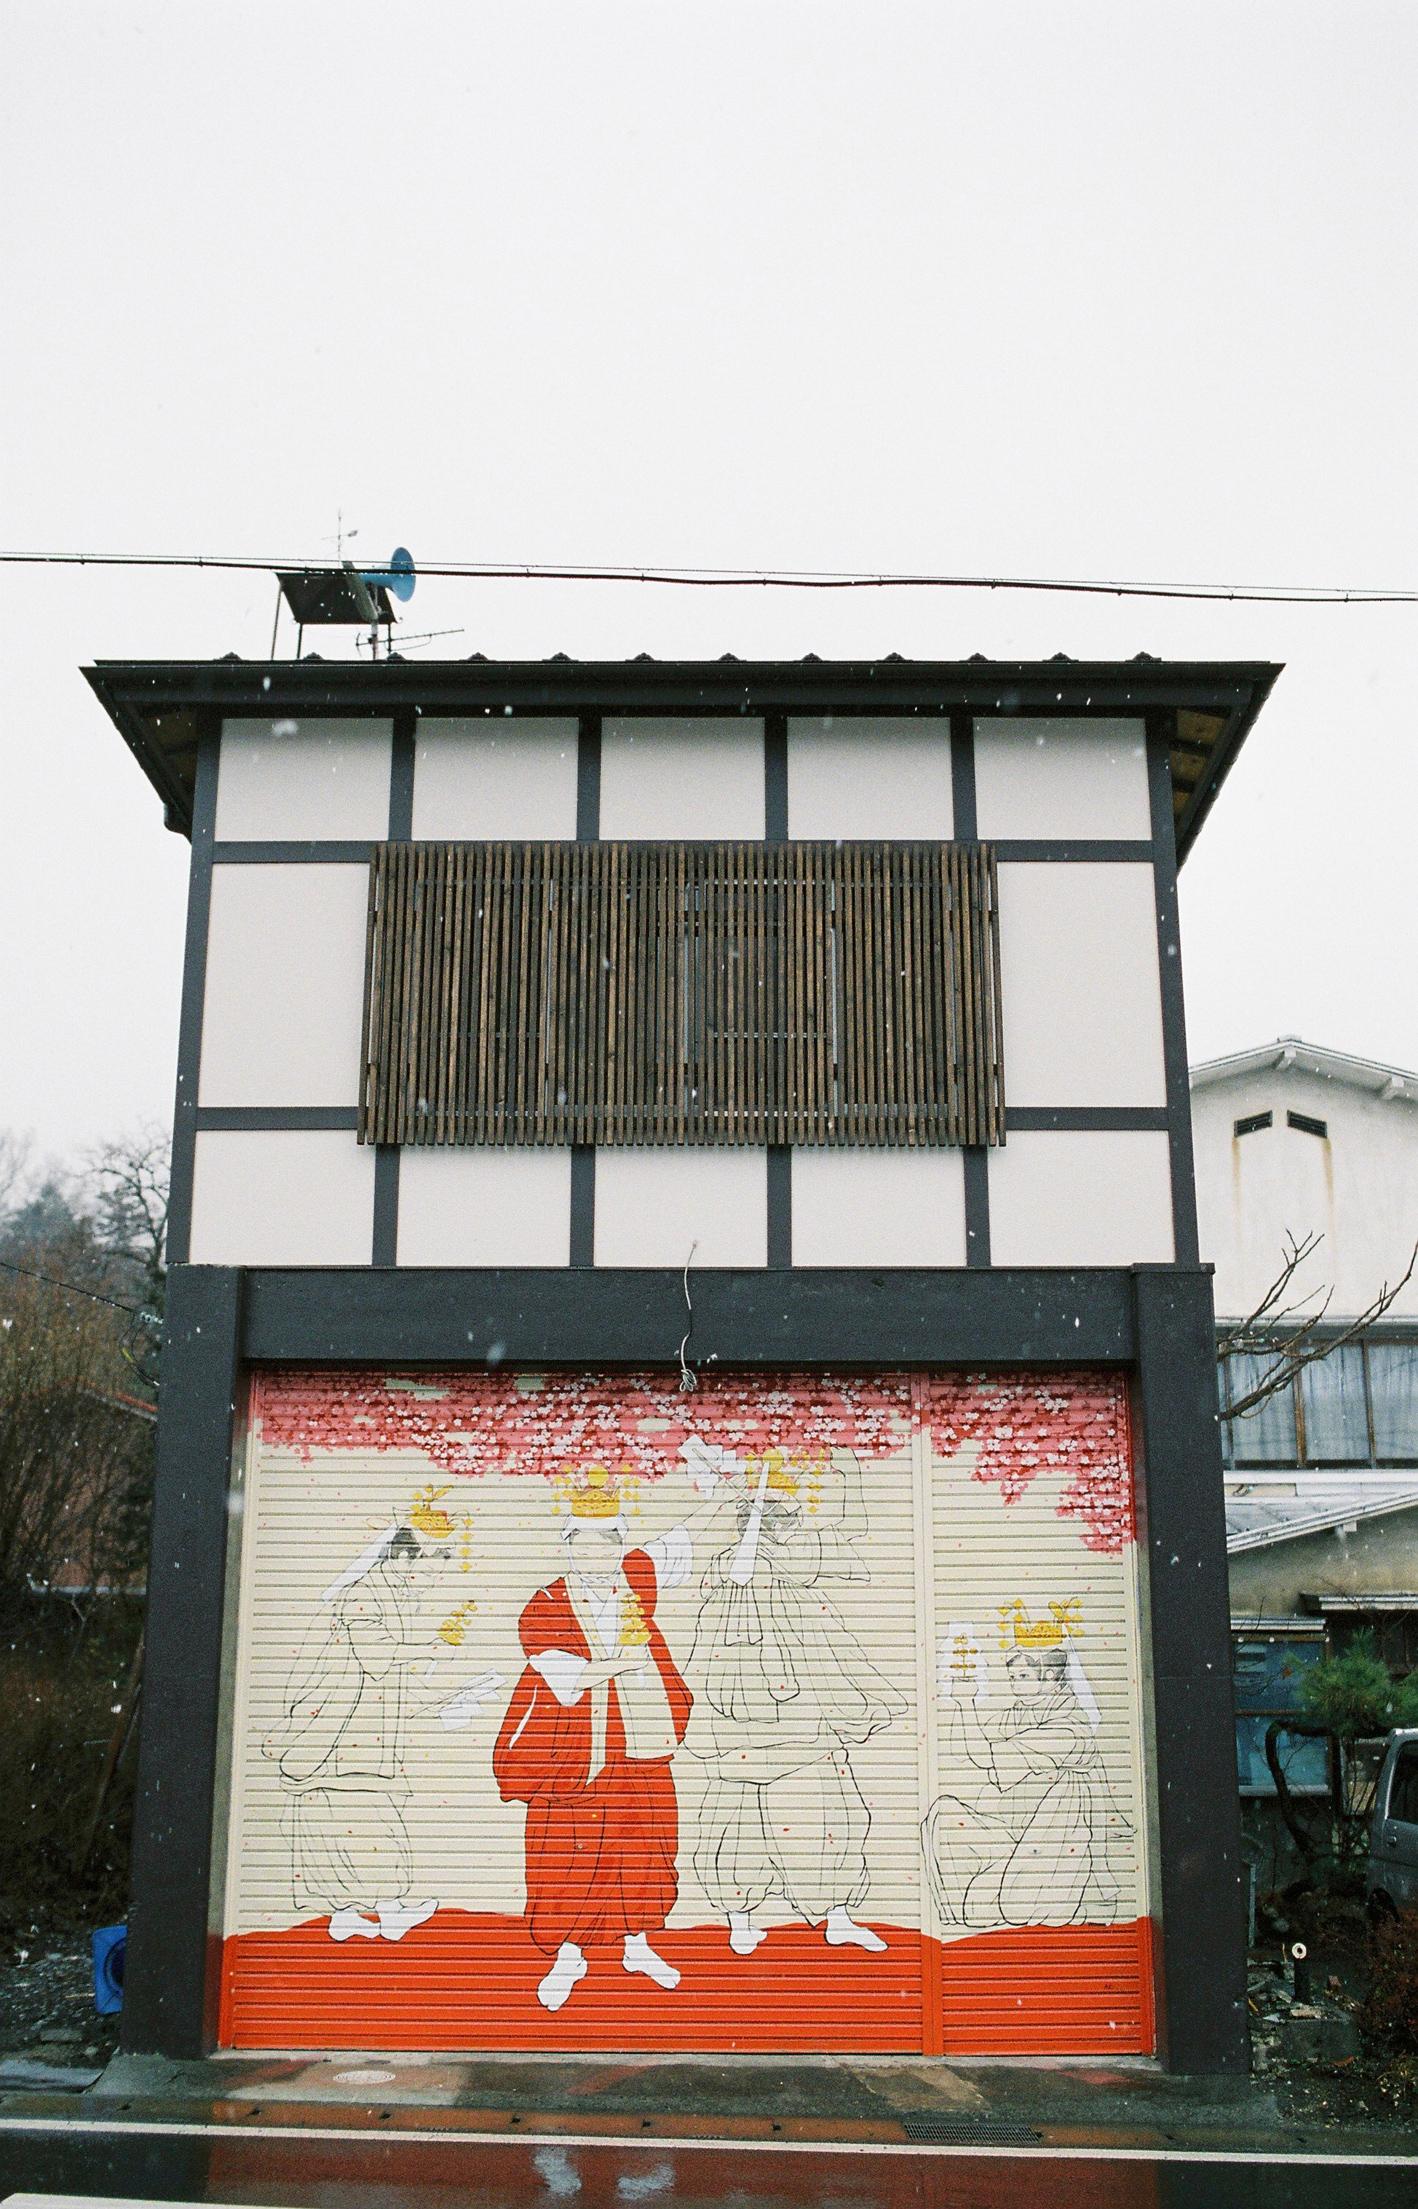 002-kawaguchiko-mount-fuji-japan-sophie-baker-photography